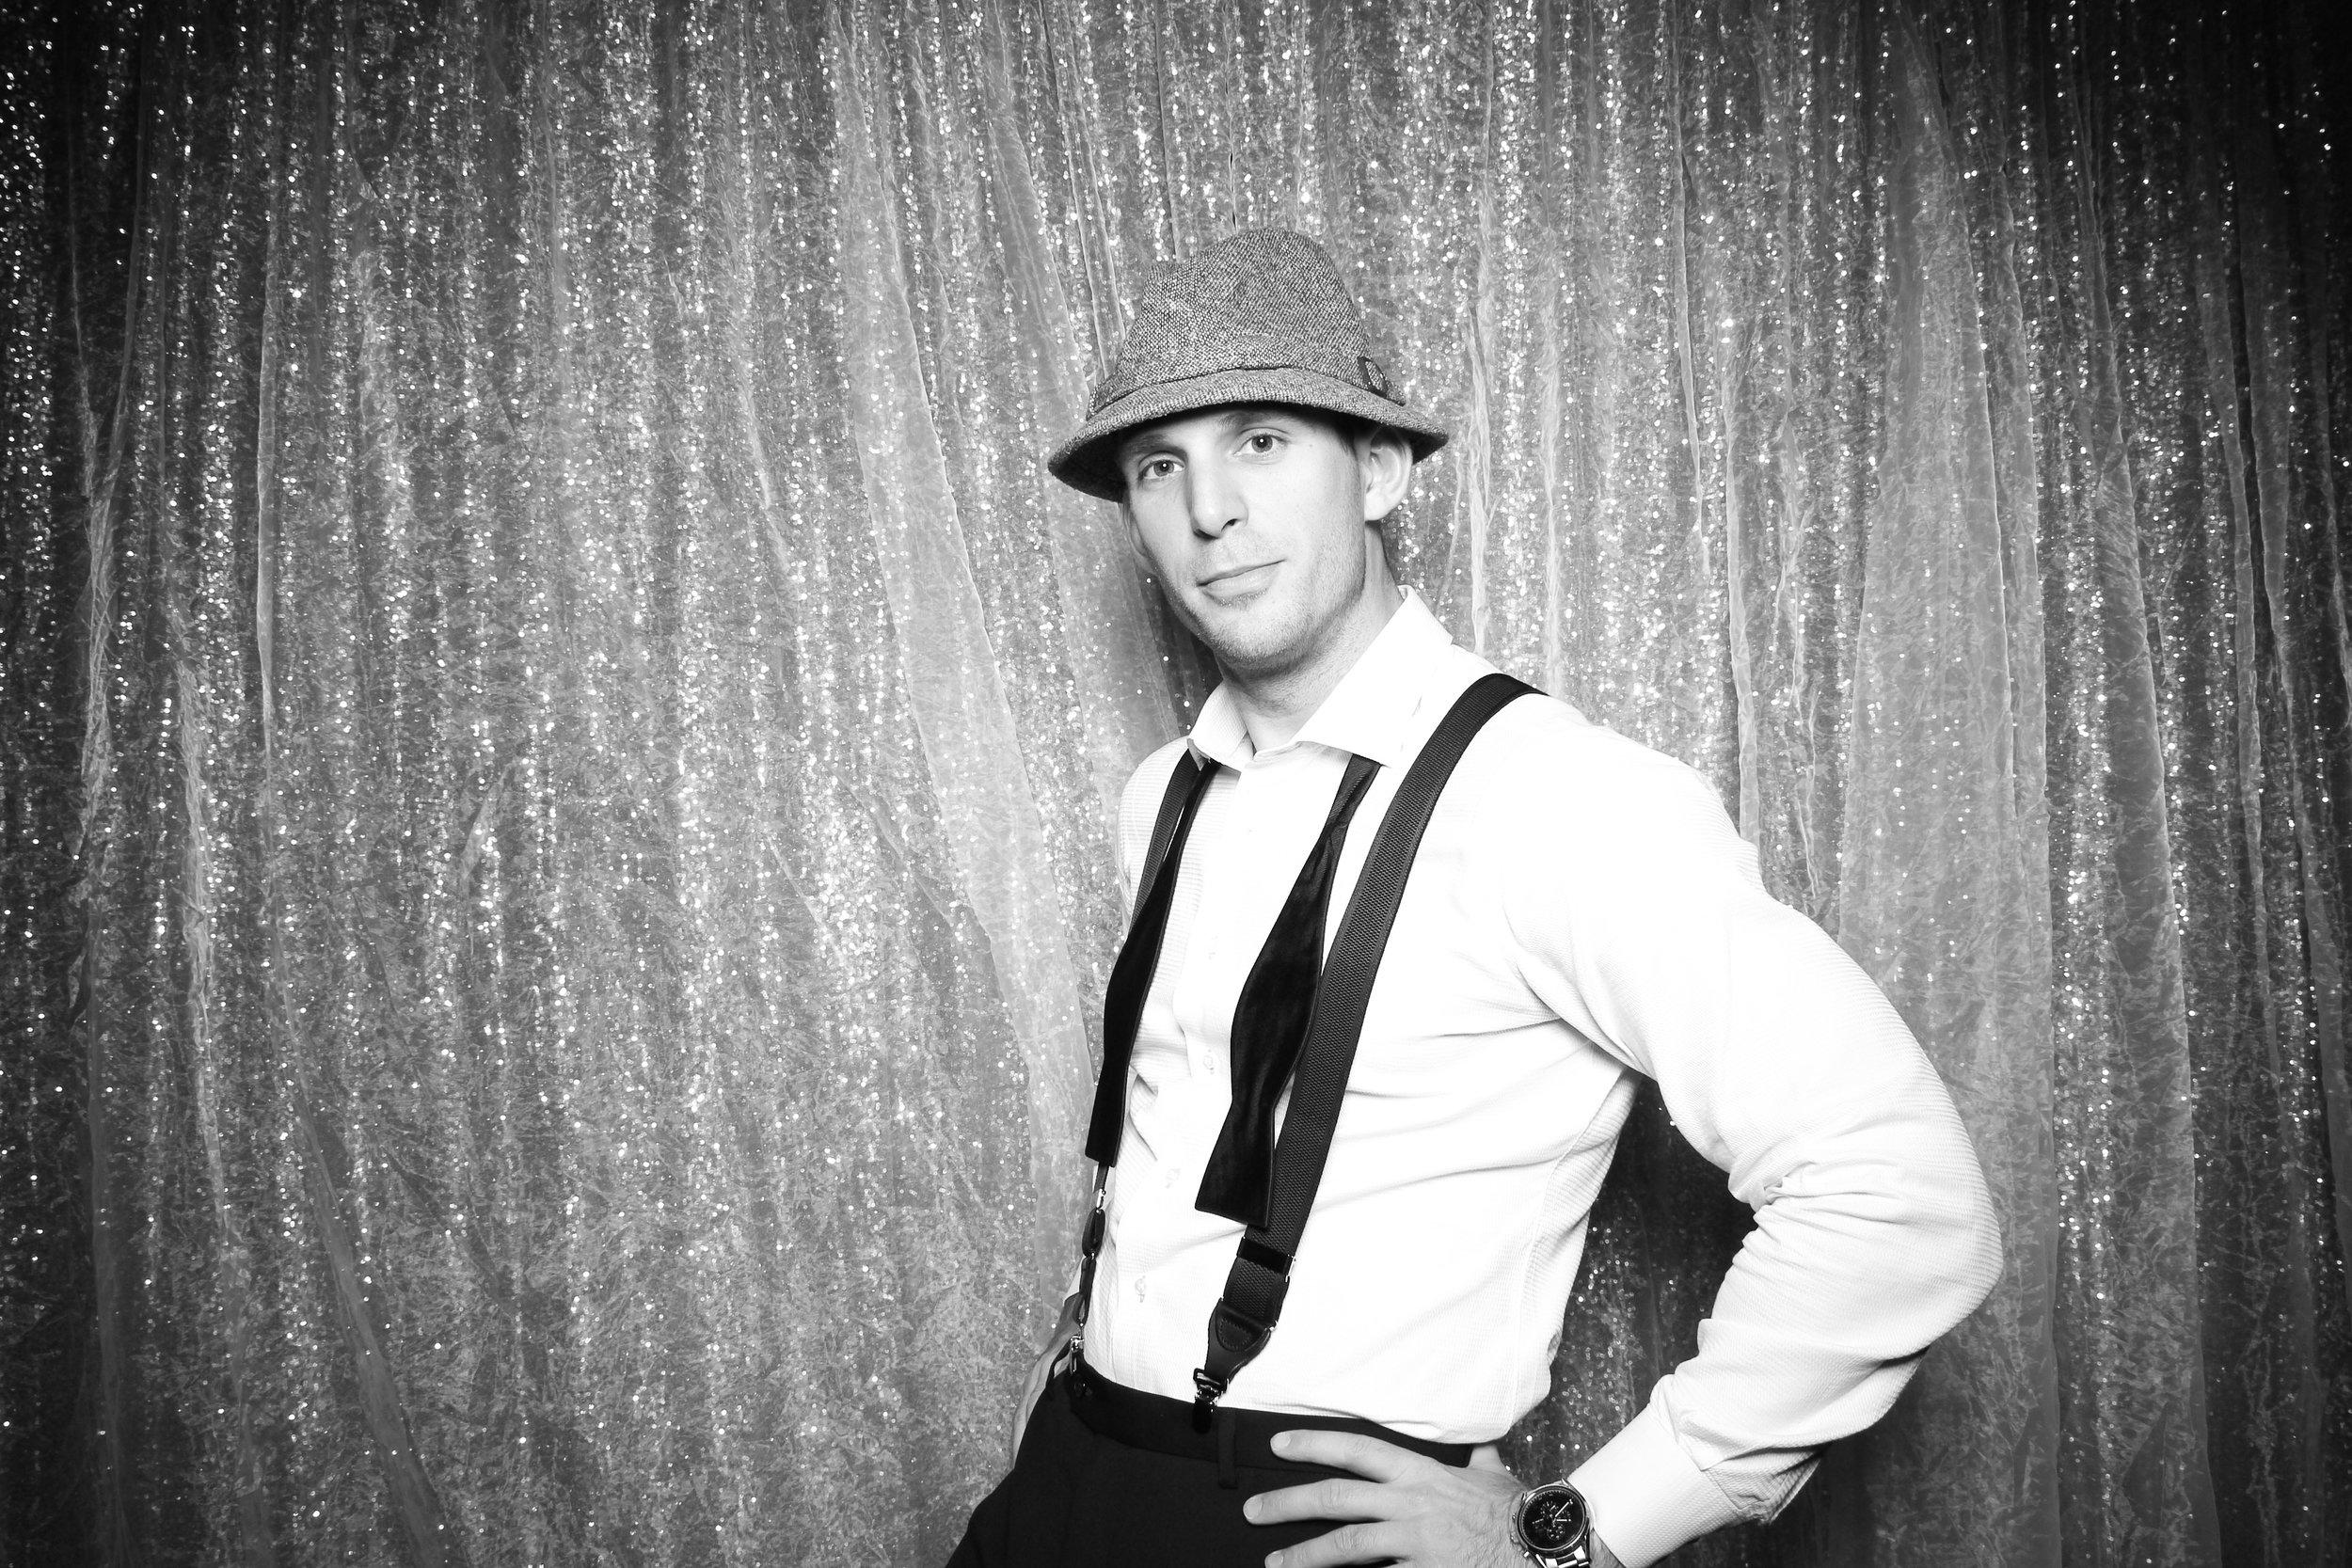 JW_Marriott_Burnham_Ballroom_Wedding_Photo_Booth_09.jpg